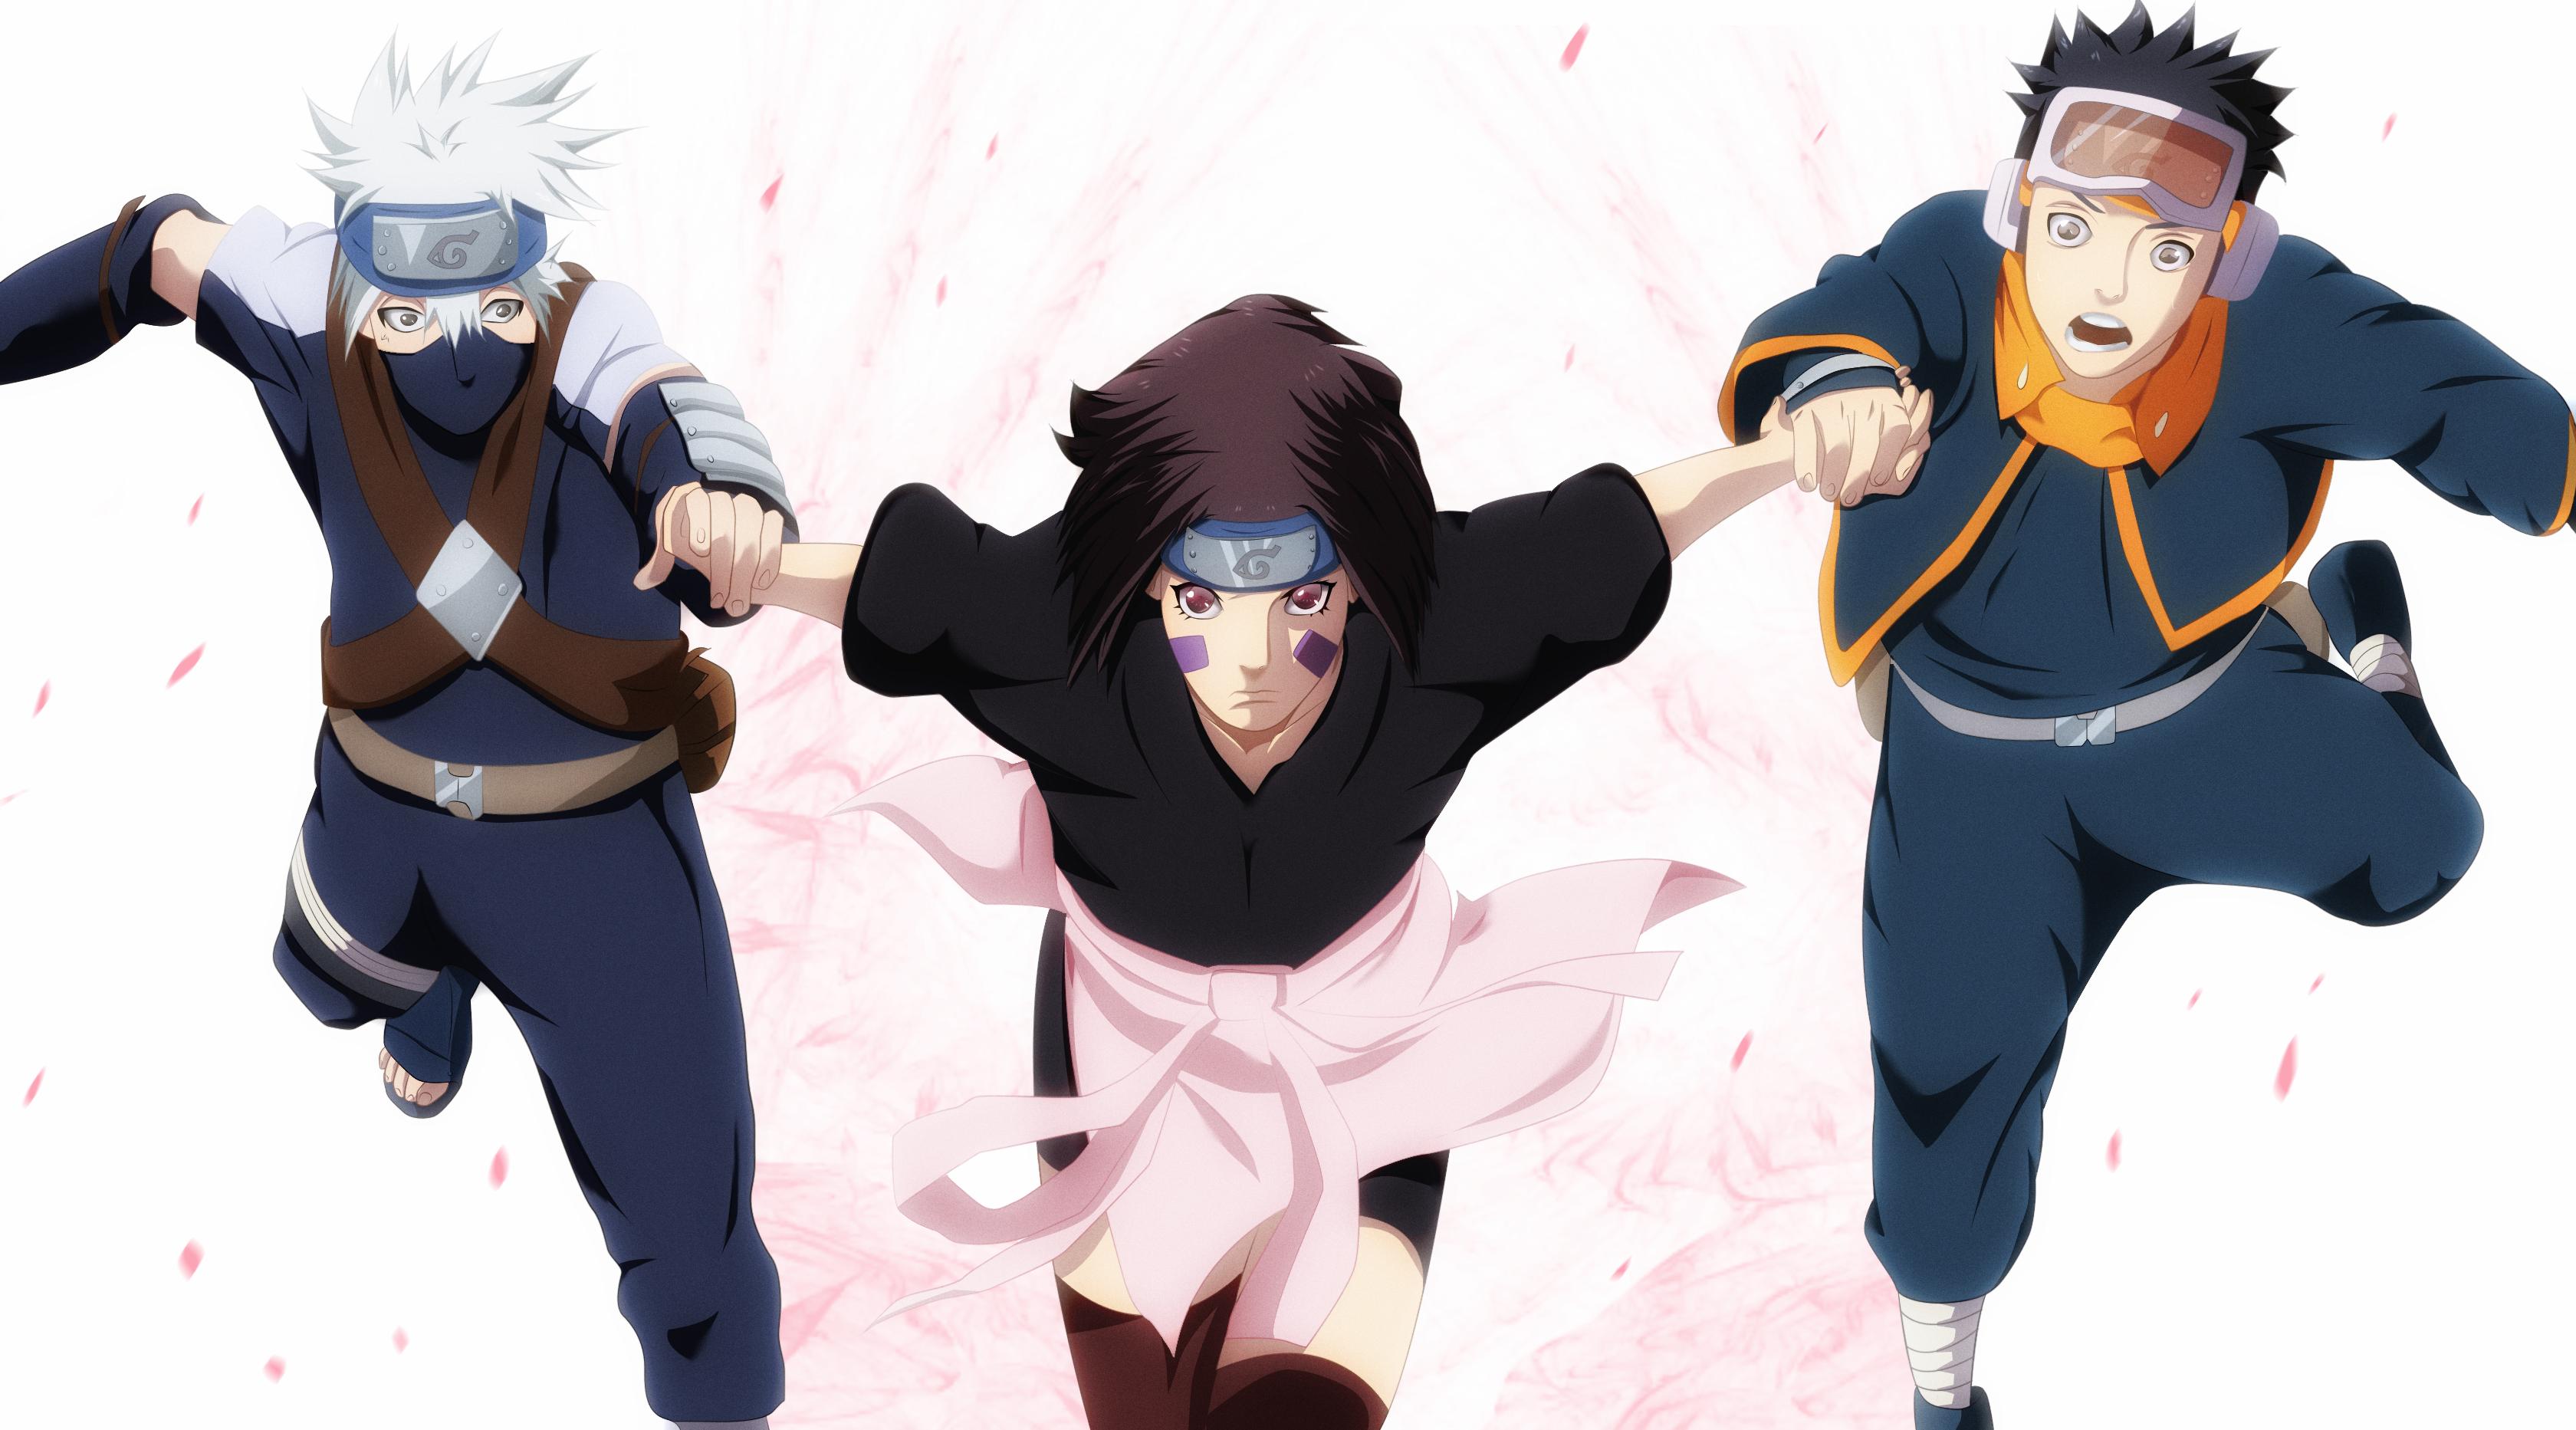 Rin We Follow You Computer Wallpapers Desktop Backgrounds 3360x1865 Id 637276 Kakashi Naruto Anime Naruto